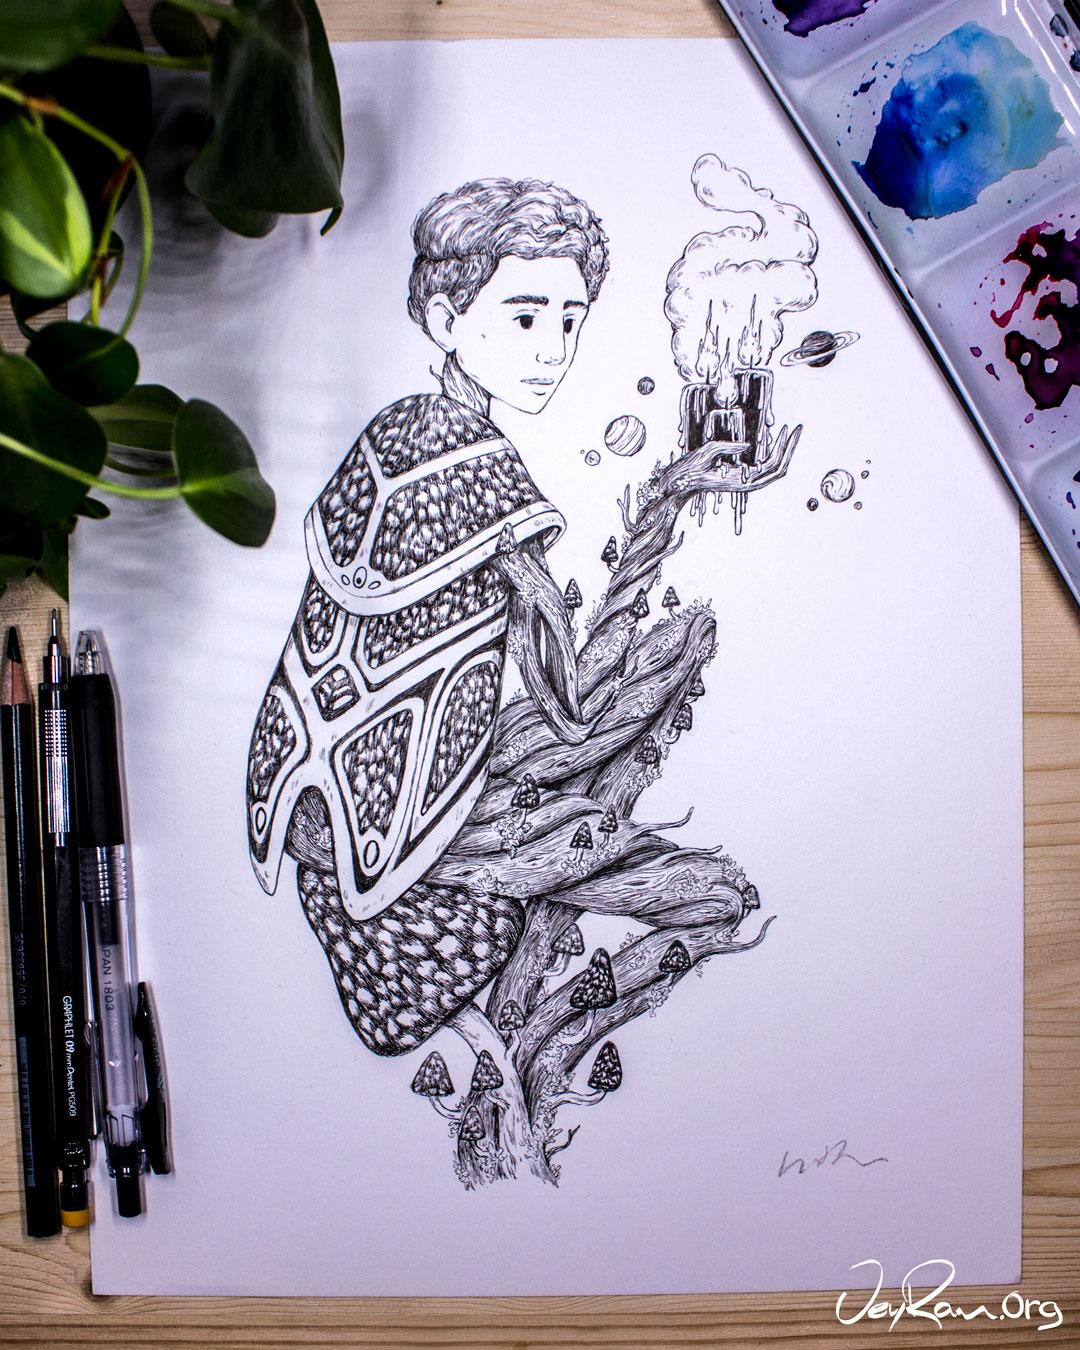 Coprinus Picaceus Mushroom Wizard - Ballpoint Pen Ink Art by JeyRam. #inktober #inkart #originalart #inktober2019 #mushroom #fungi